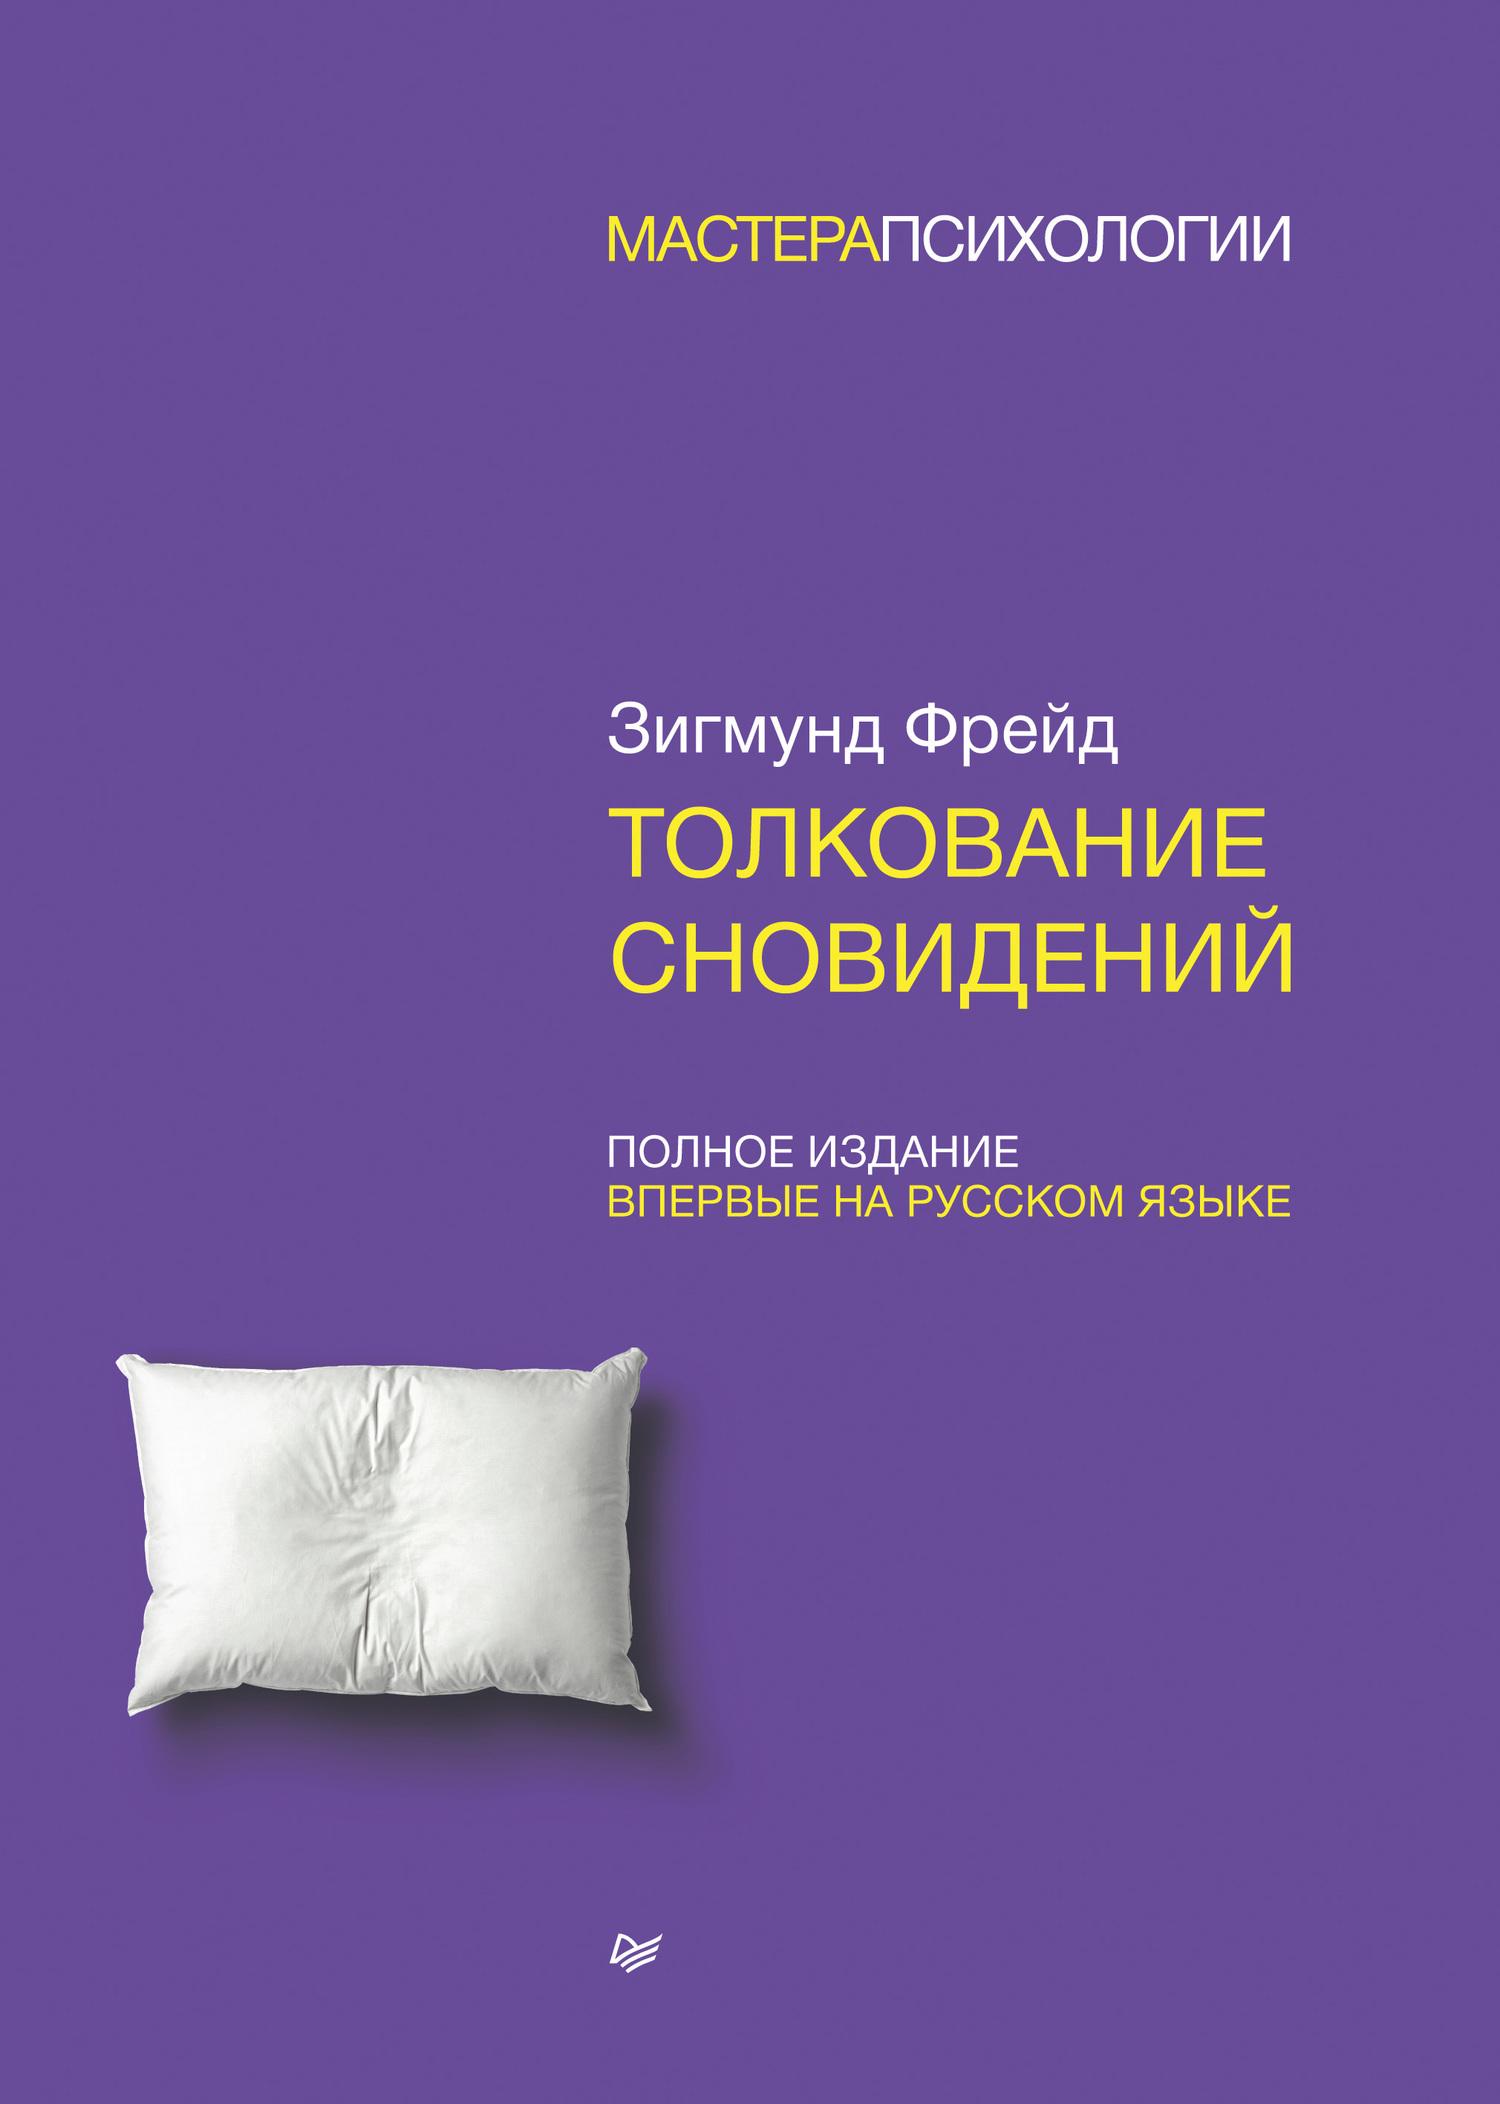 Зигмунд Фрейд «Толкование сновидений. Полное издание»